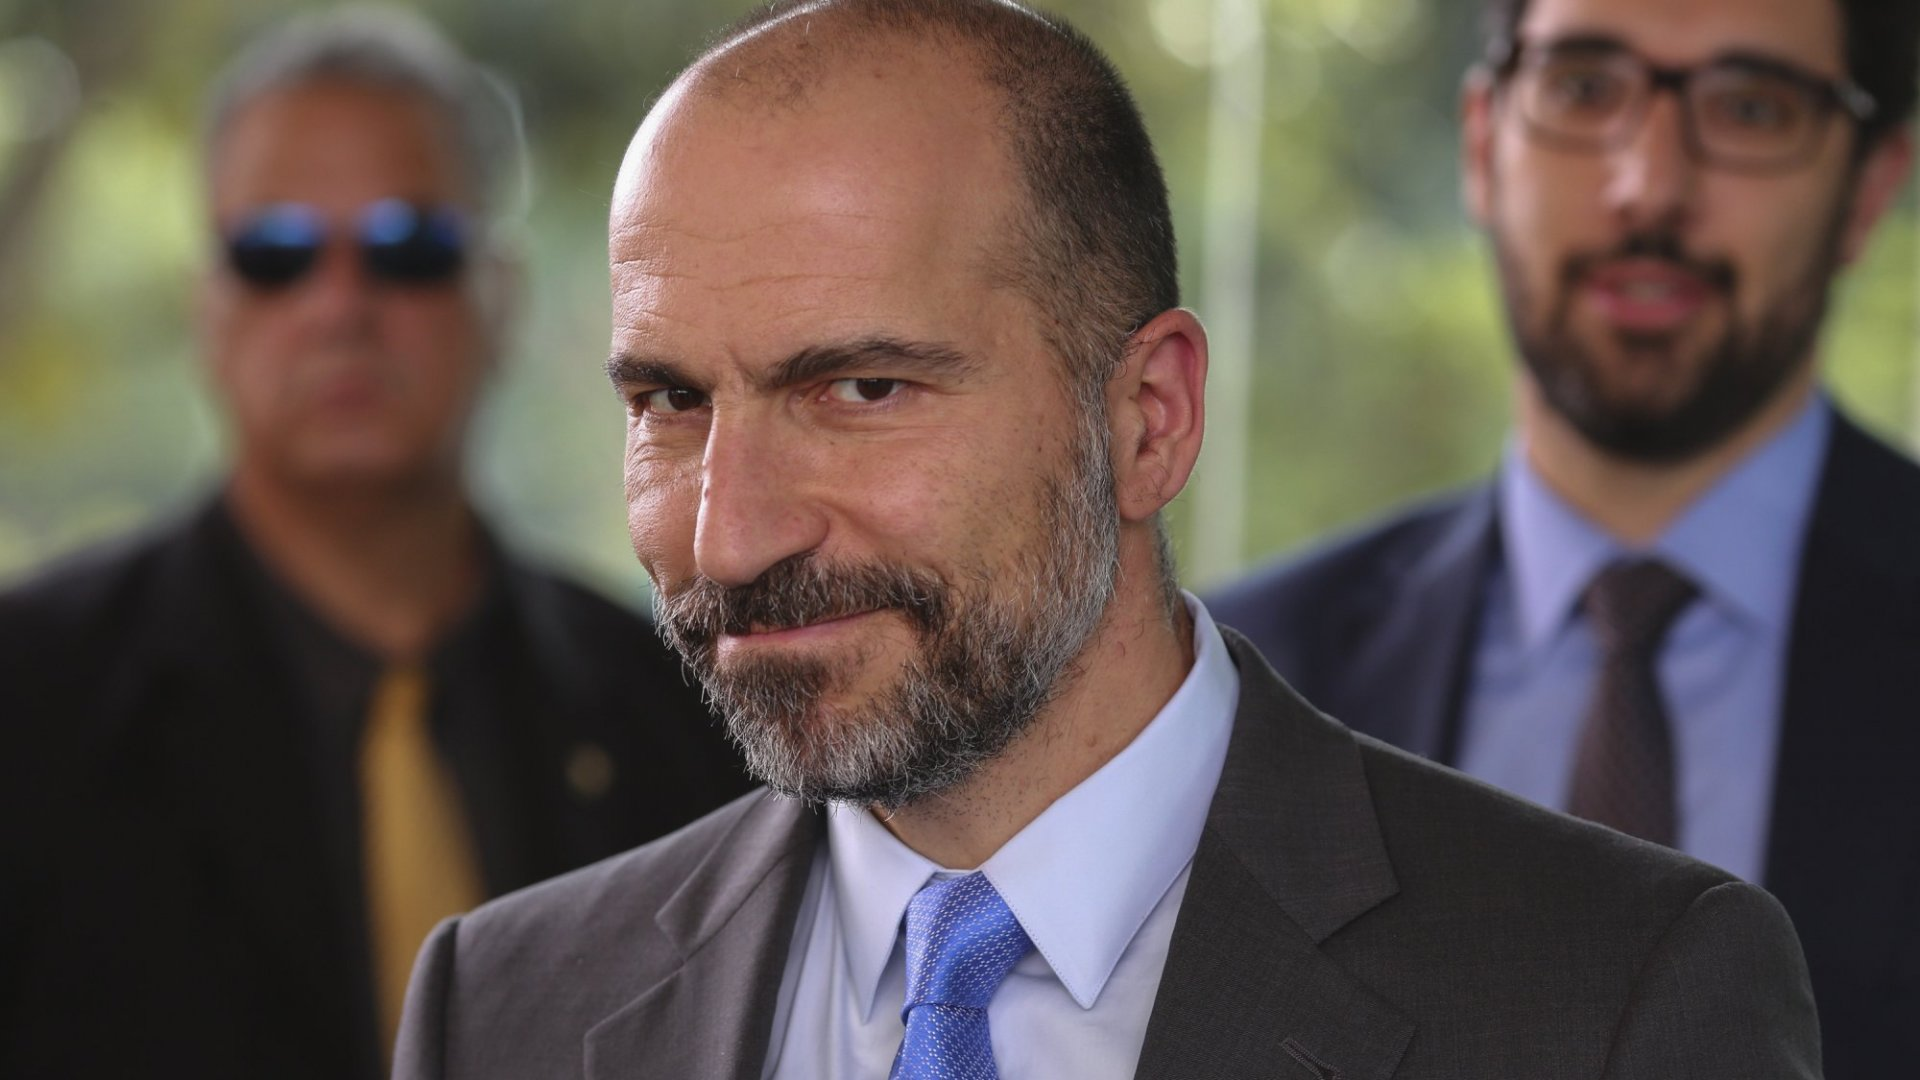 Uber Reaches $1 Billion Deal With Softbank